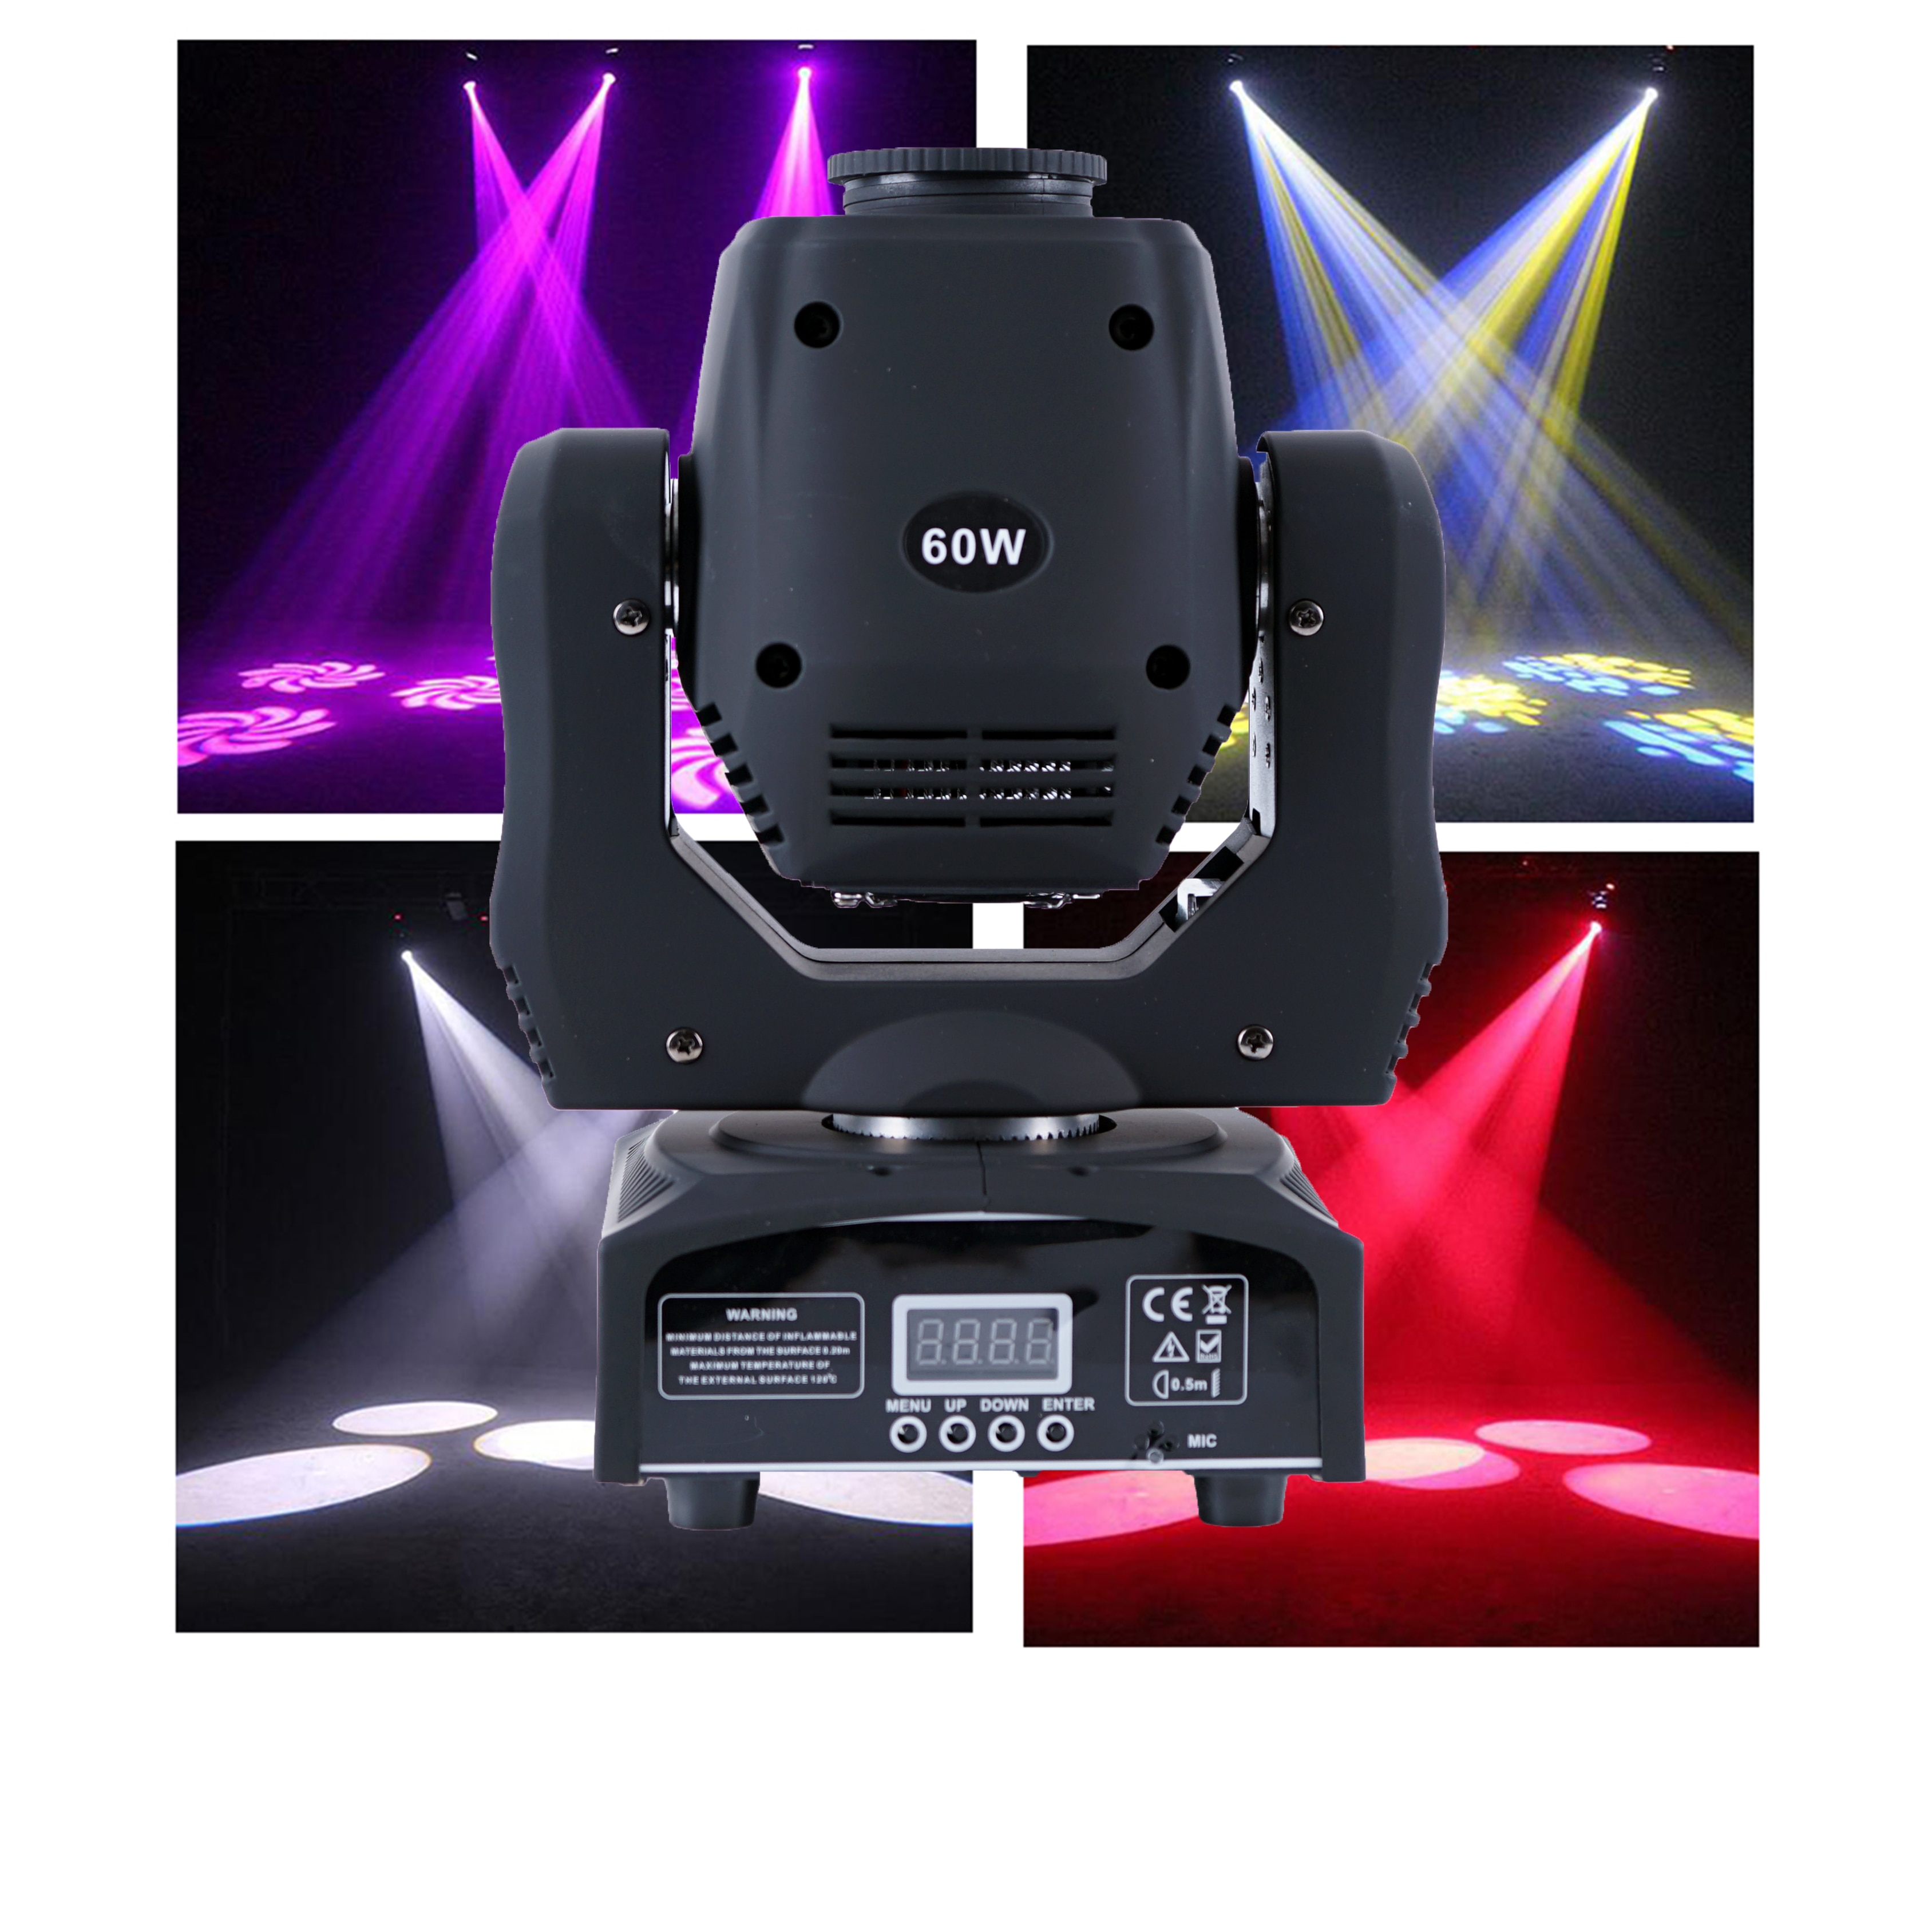 Ya Yao Stage Lights LED 60W Pattern Shake Head Lights Beam Lights New Bar KTV Club Shake Head Lights head head supershape i rally sw mfpr prd 12 gw brake 85 [f] 18 19 размер 177